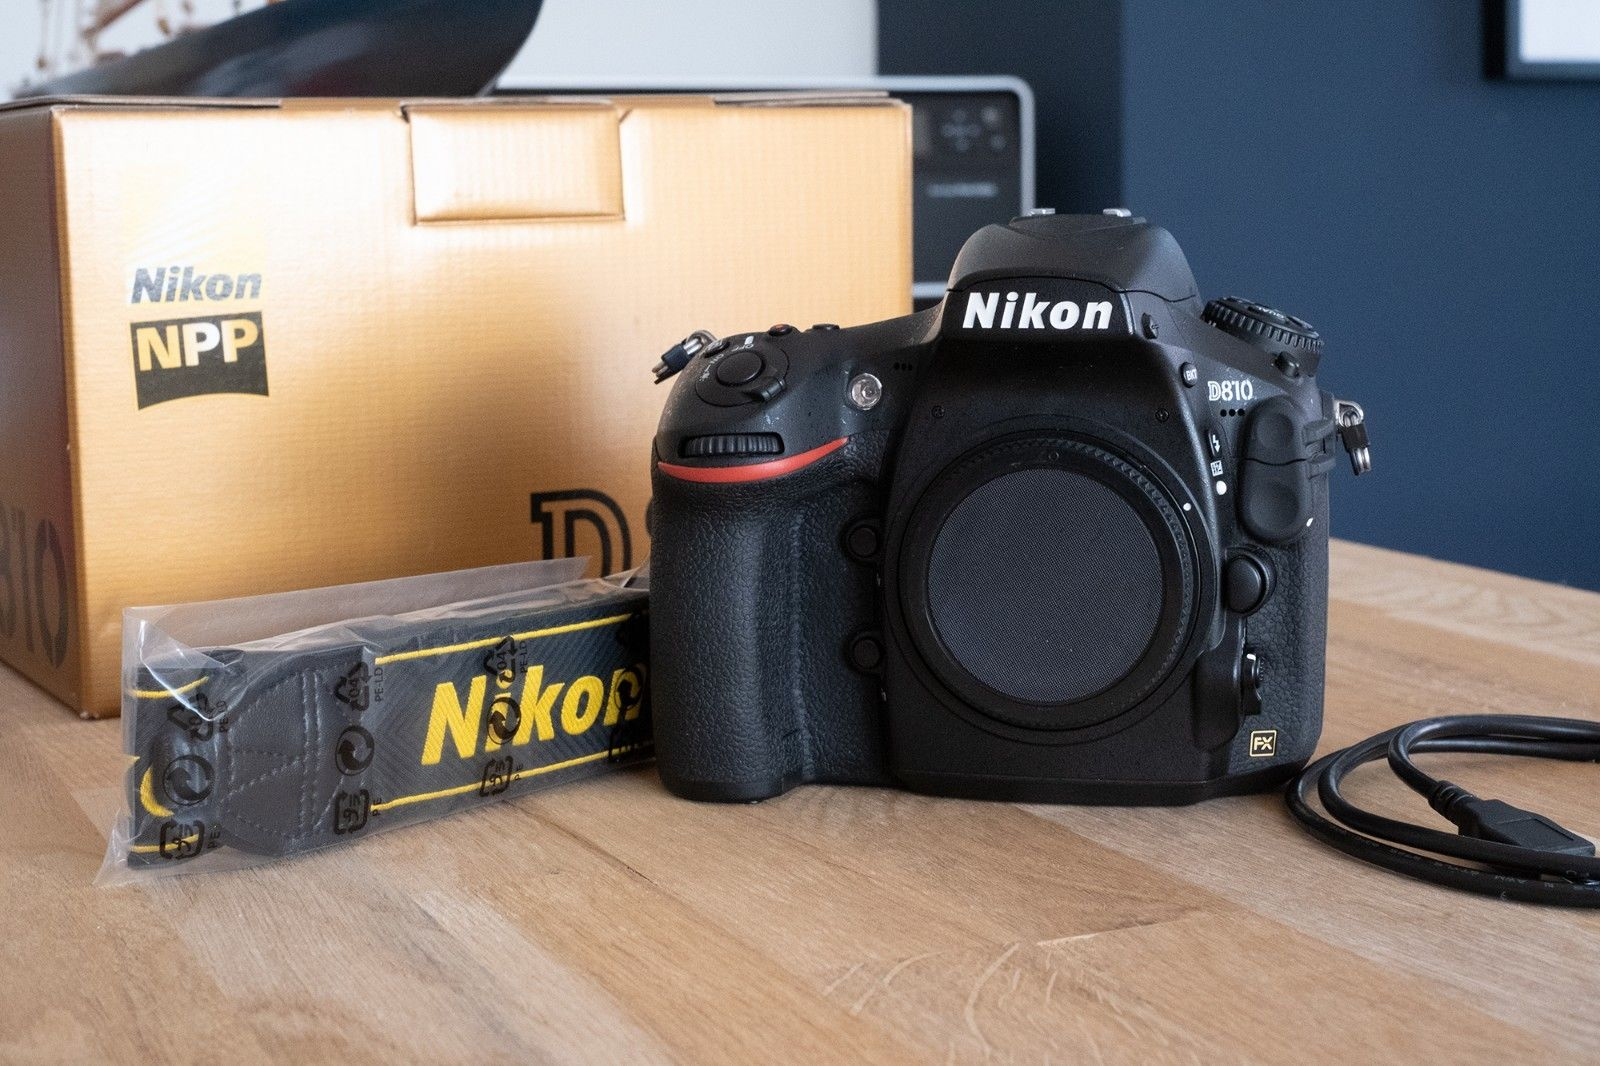 Nikon D D810 36.3MP Digitalkamera - Schwarz (Nur Gehäuse) ORIGINALVERPACKT